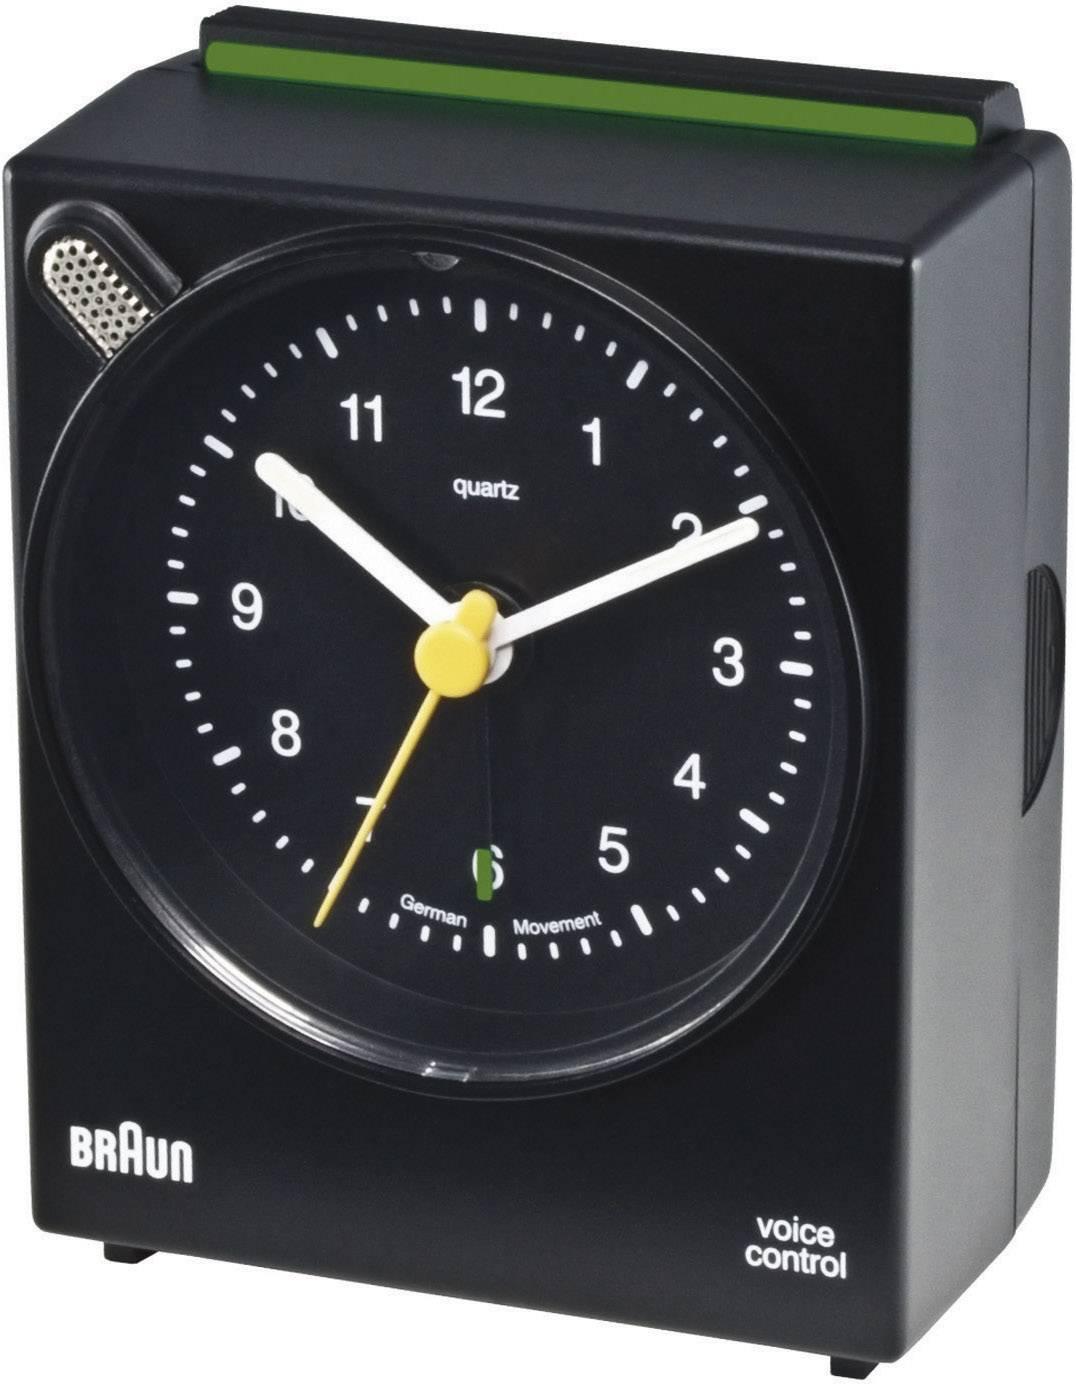 Analogový budík Braun voice control, 660060, 63 x 76 x 34 mm, černá